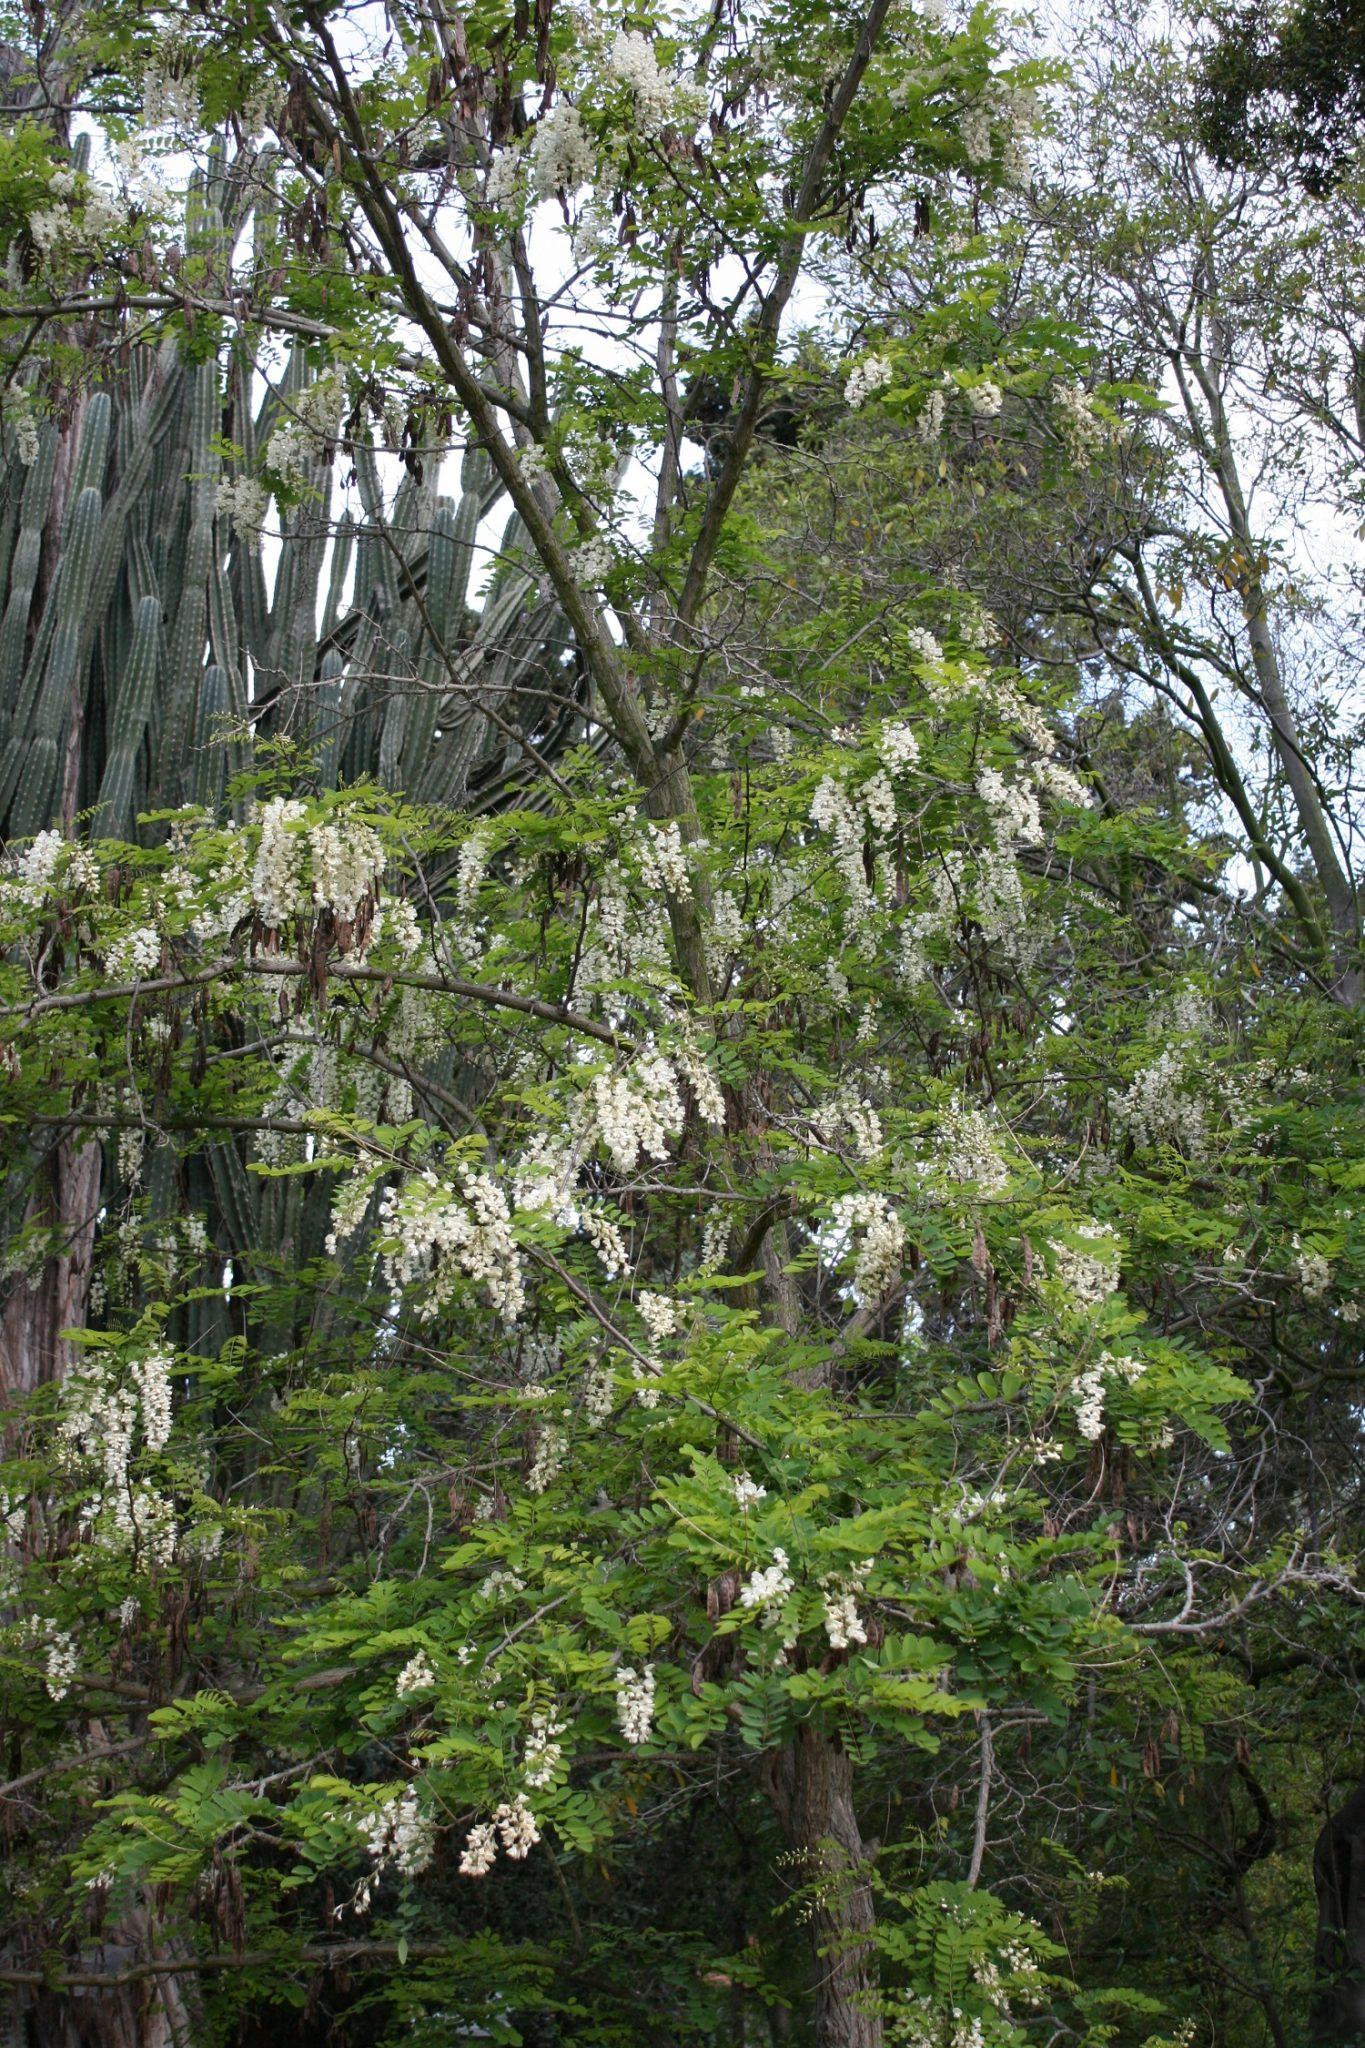 Robinia pseudoacacia - Black Locust